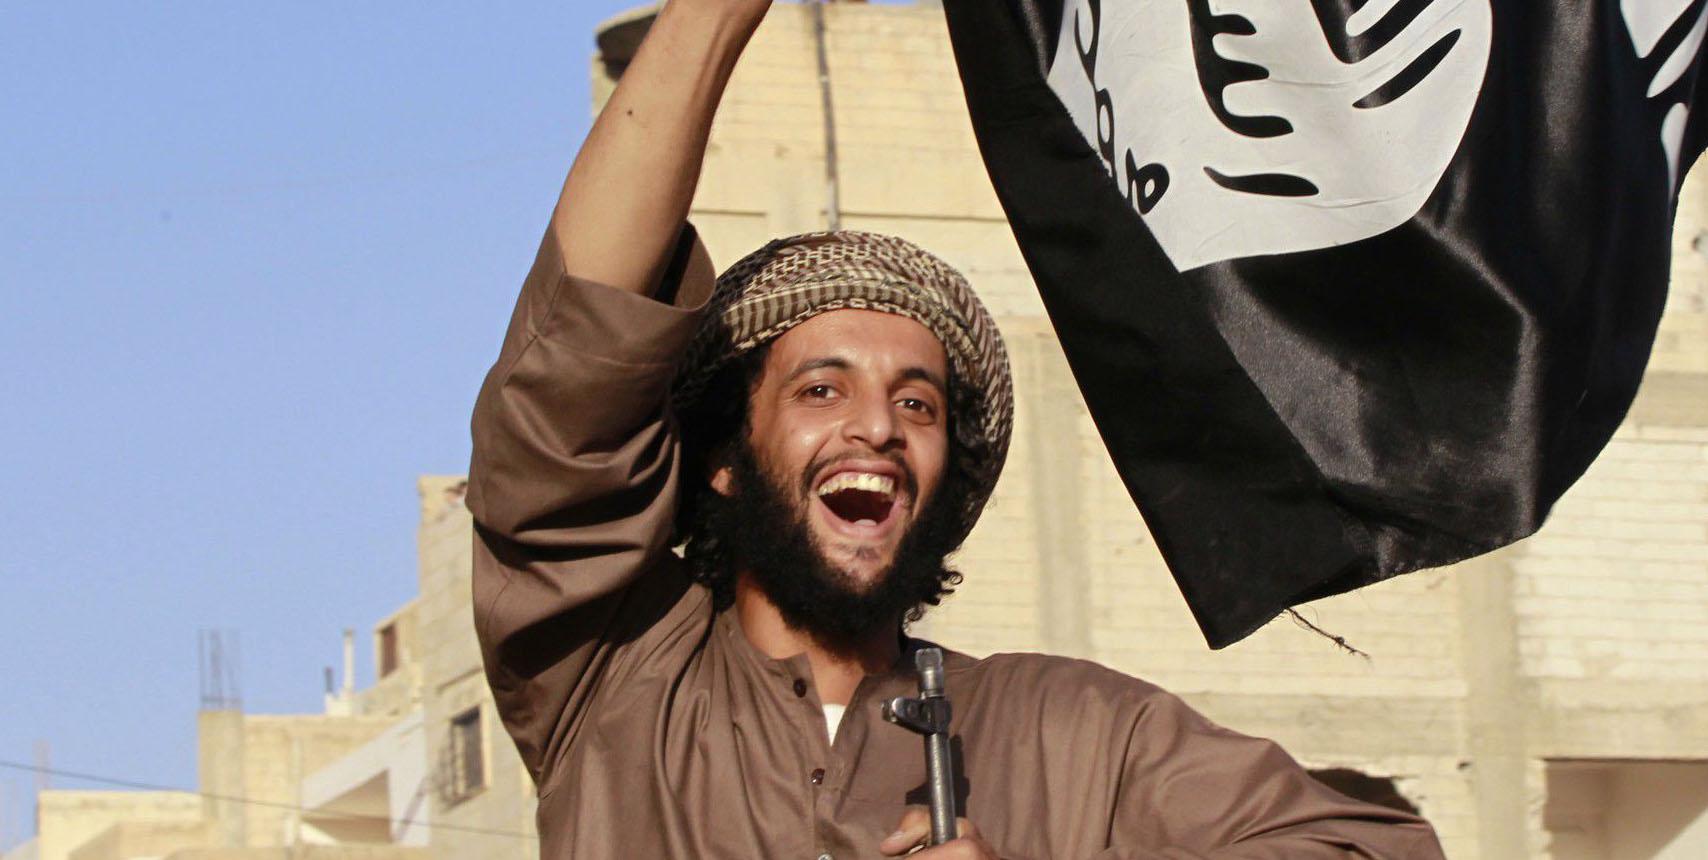 Dschihadist